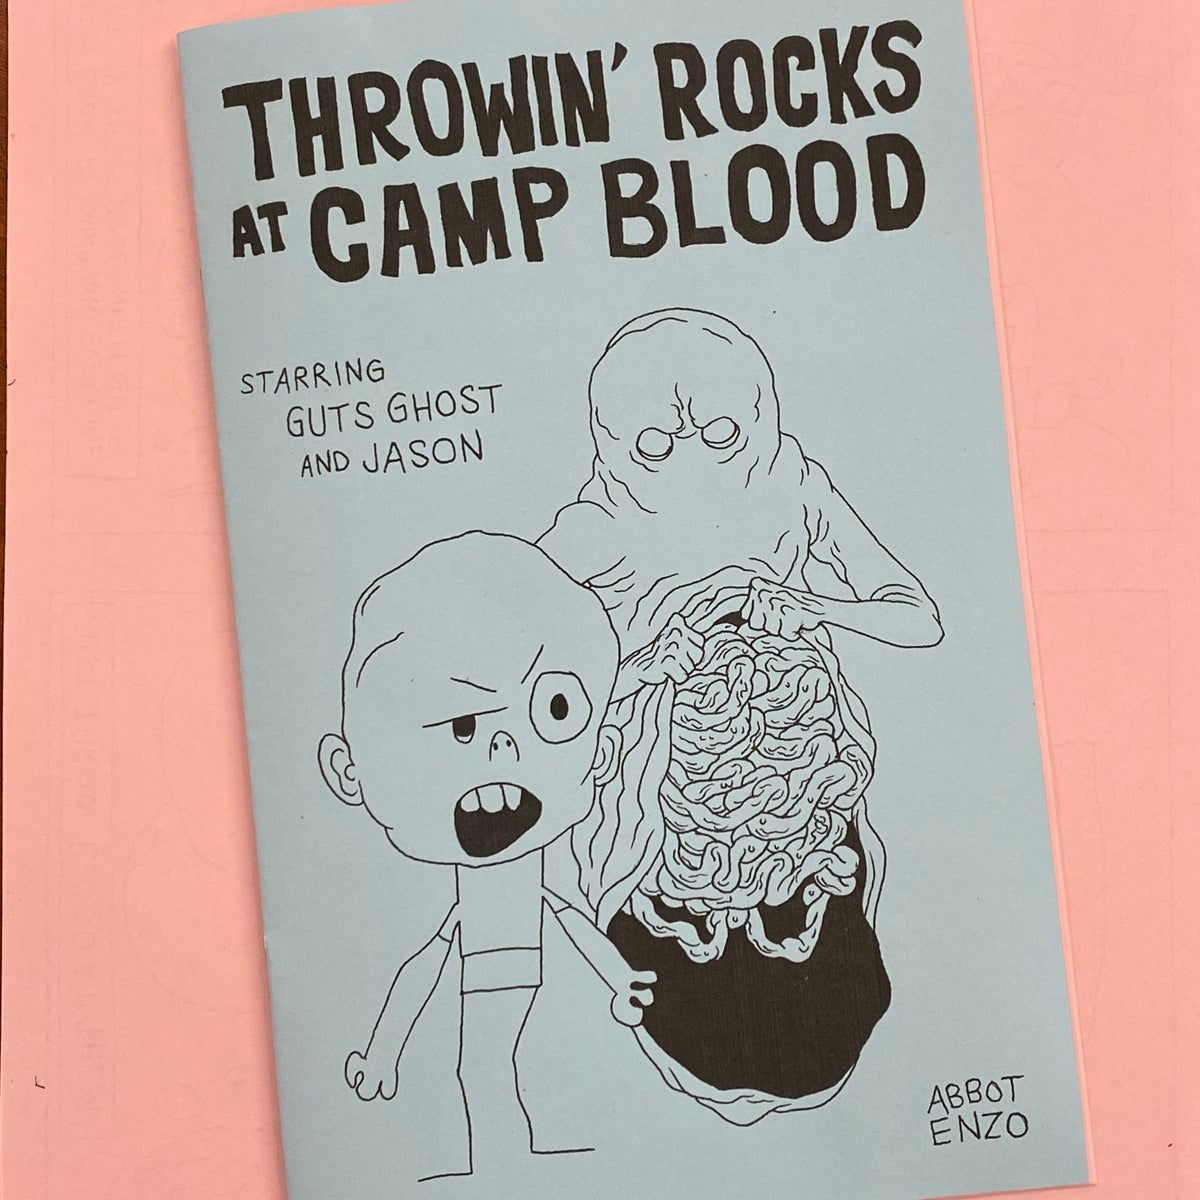 Image of Throwin' Rocks at Camp Blood mini comic